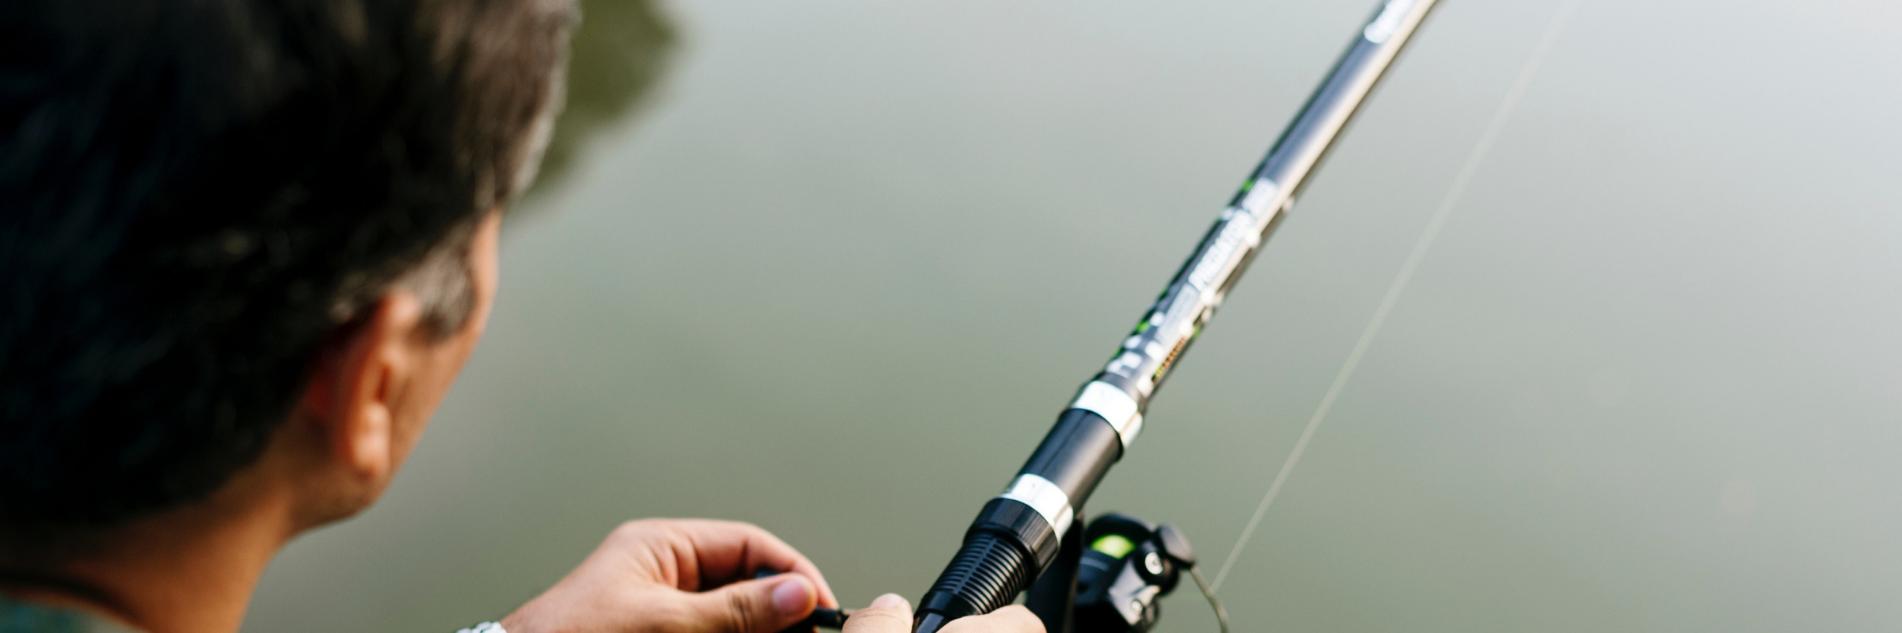 ribolovački štap, štapovi